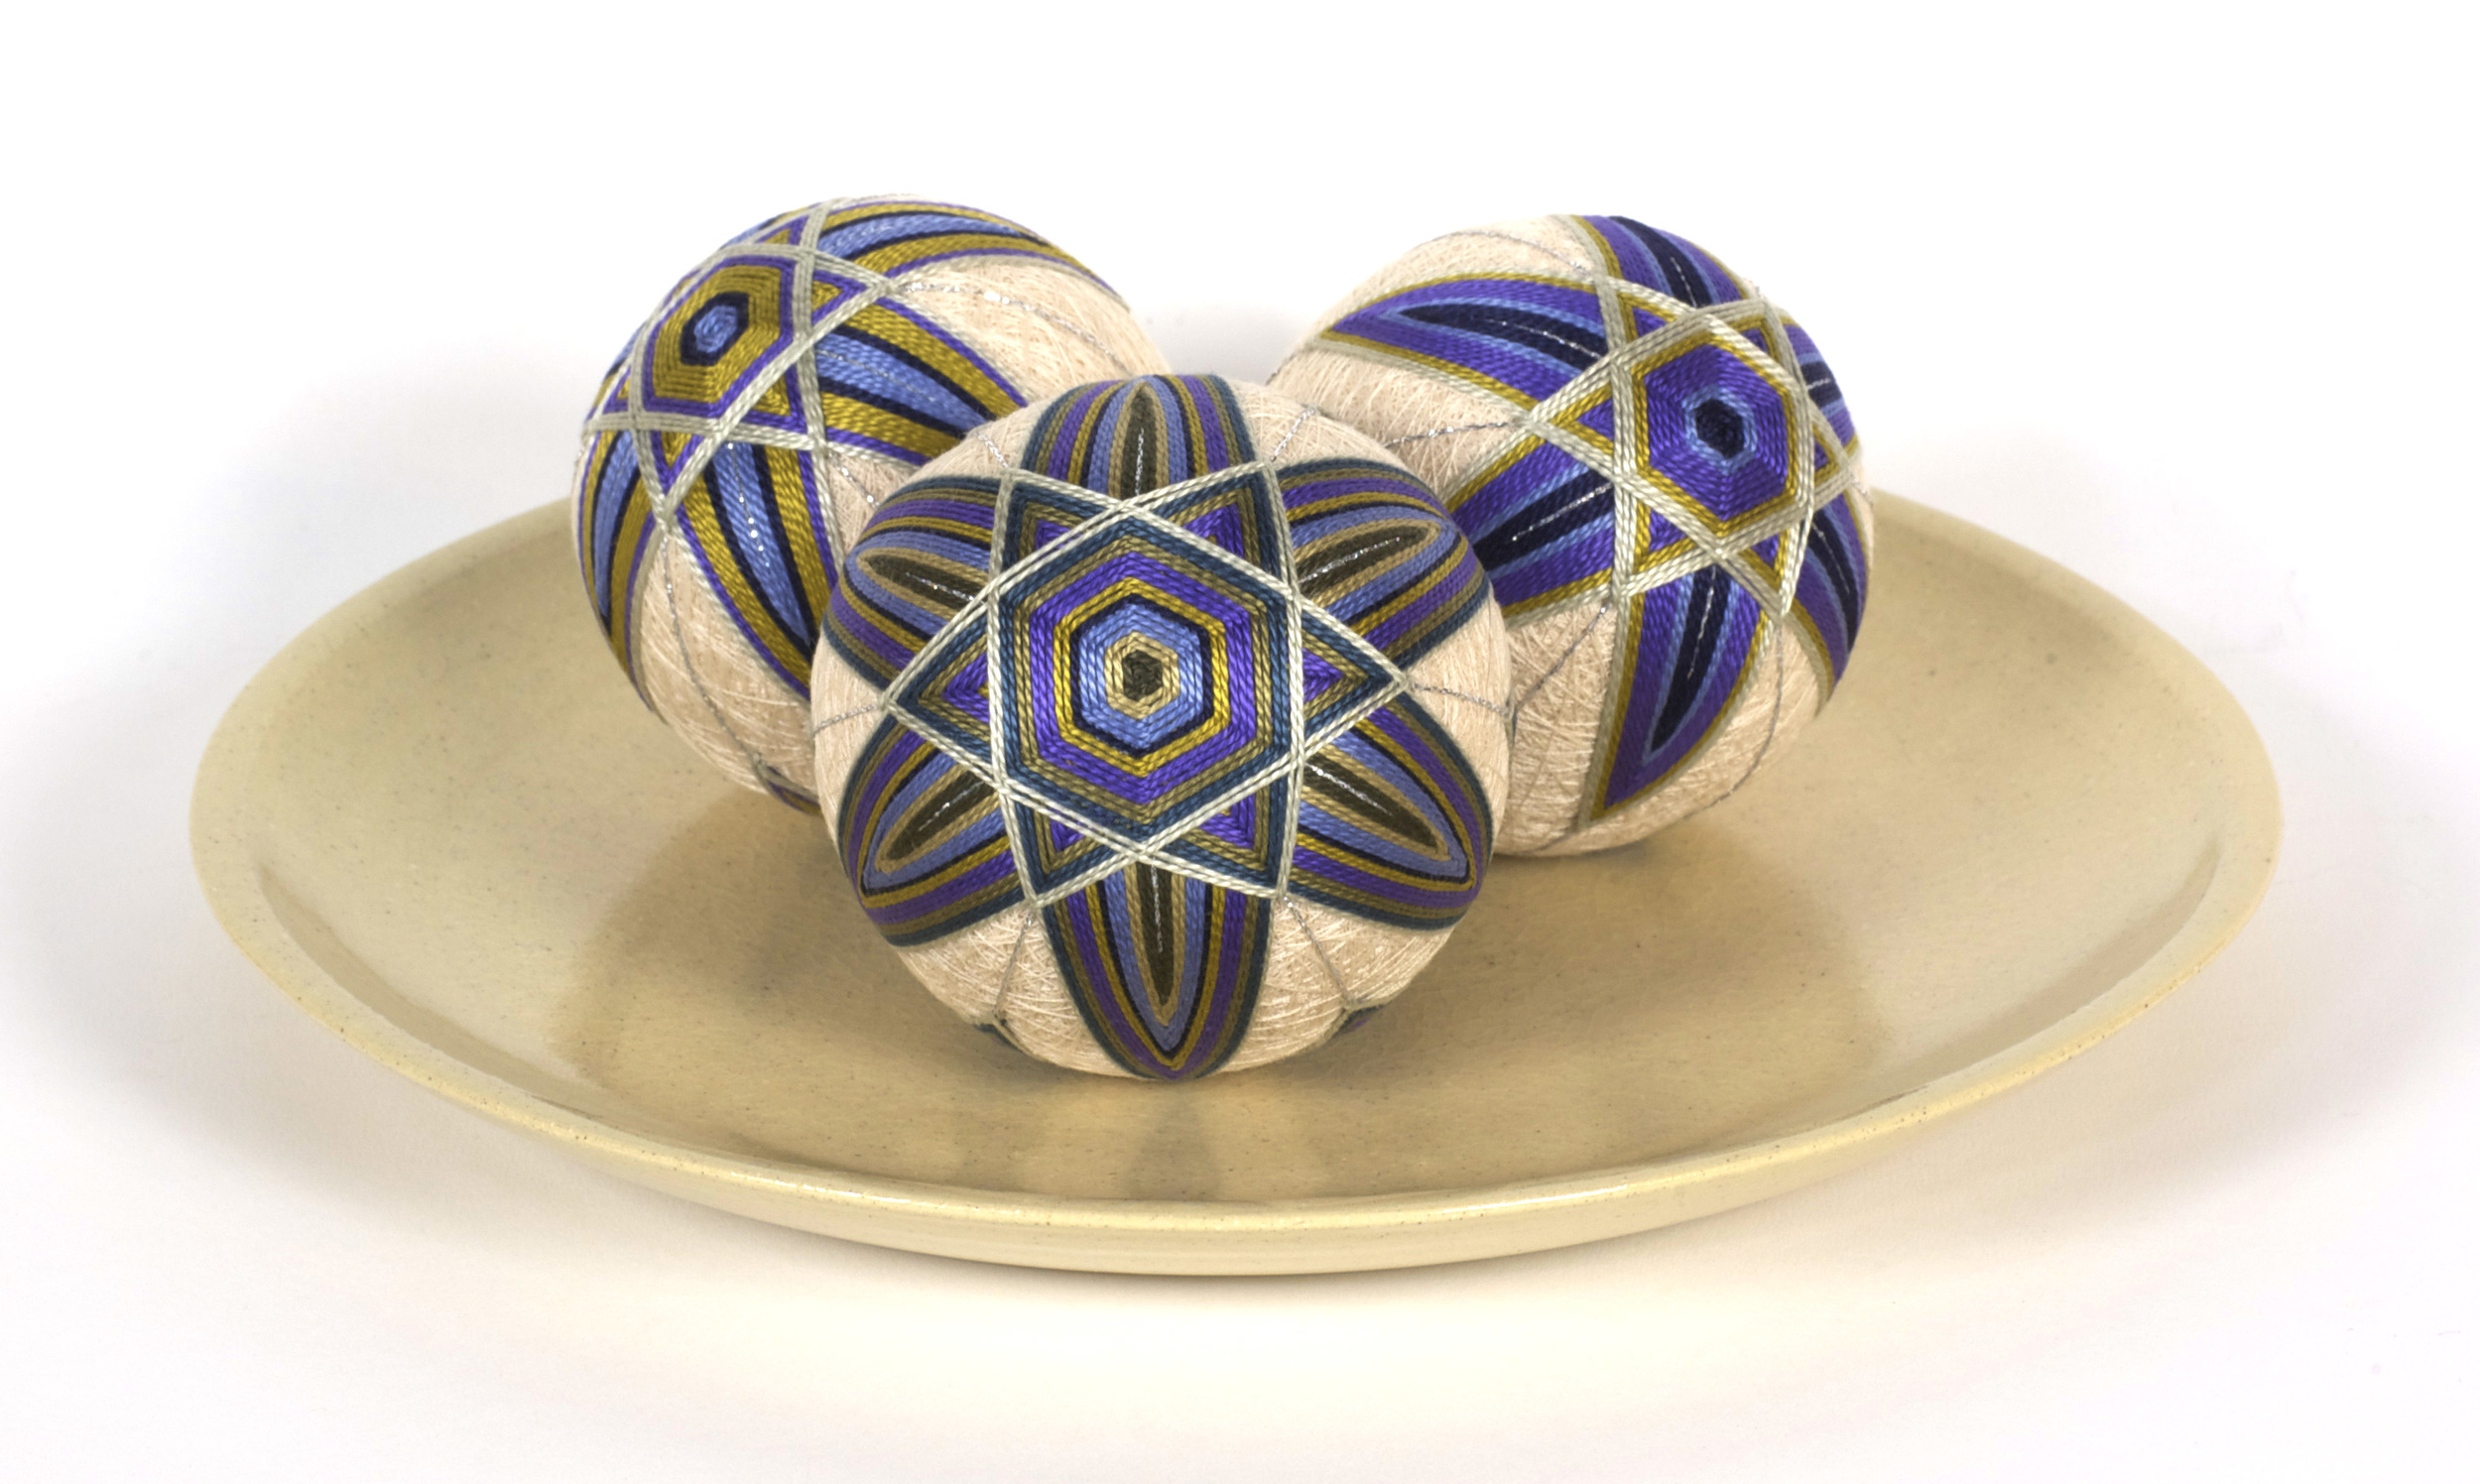 Susan E. Kelly     This Beautiful Path   –   Set of   3   Japanese Temari , 2012  Mixed media (rice hulls, yarn, thread, embroidery thread)